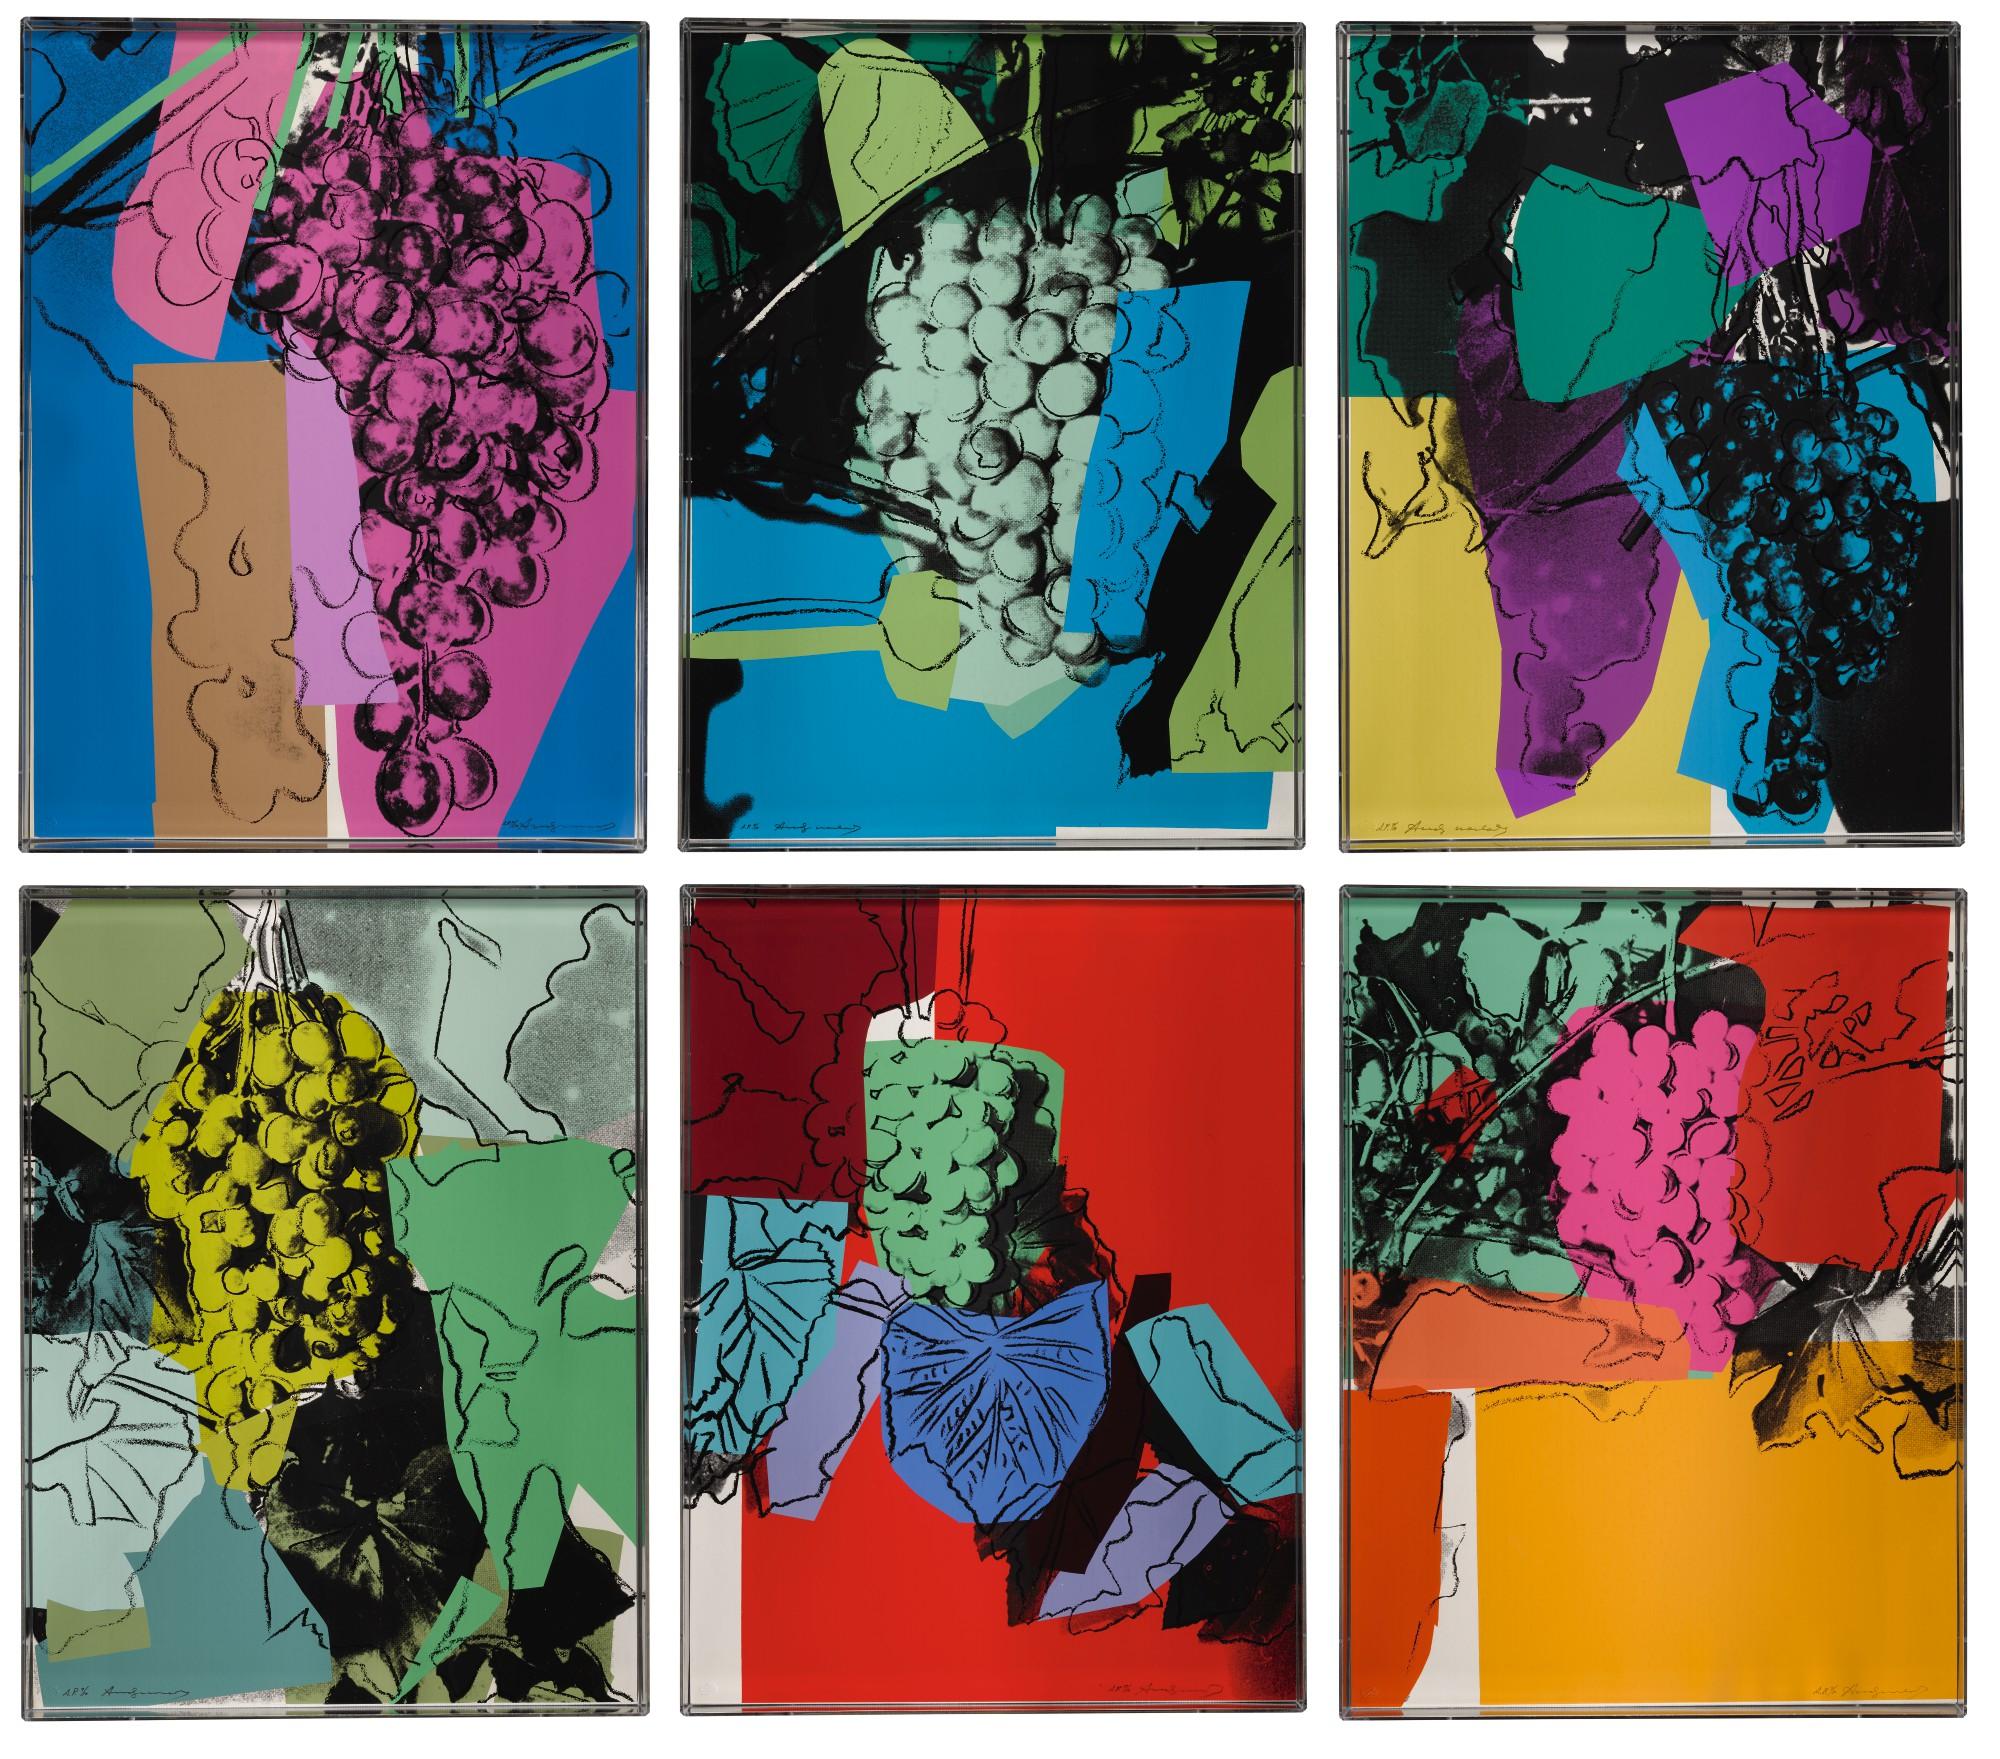 L'uva dorata di Andy Warhol. Battuta da Sotheby's a 375 mila dollari